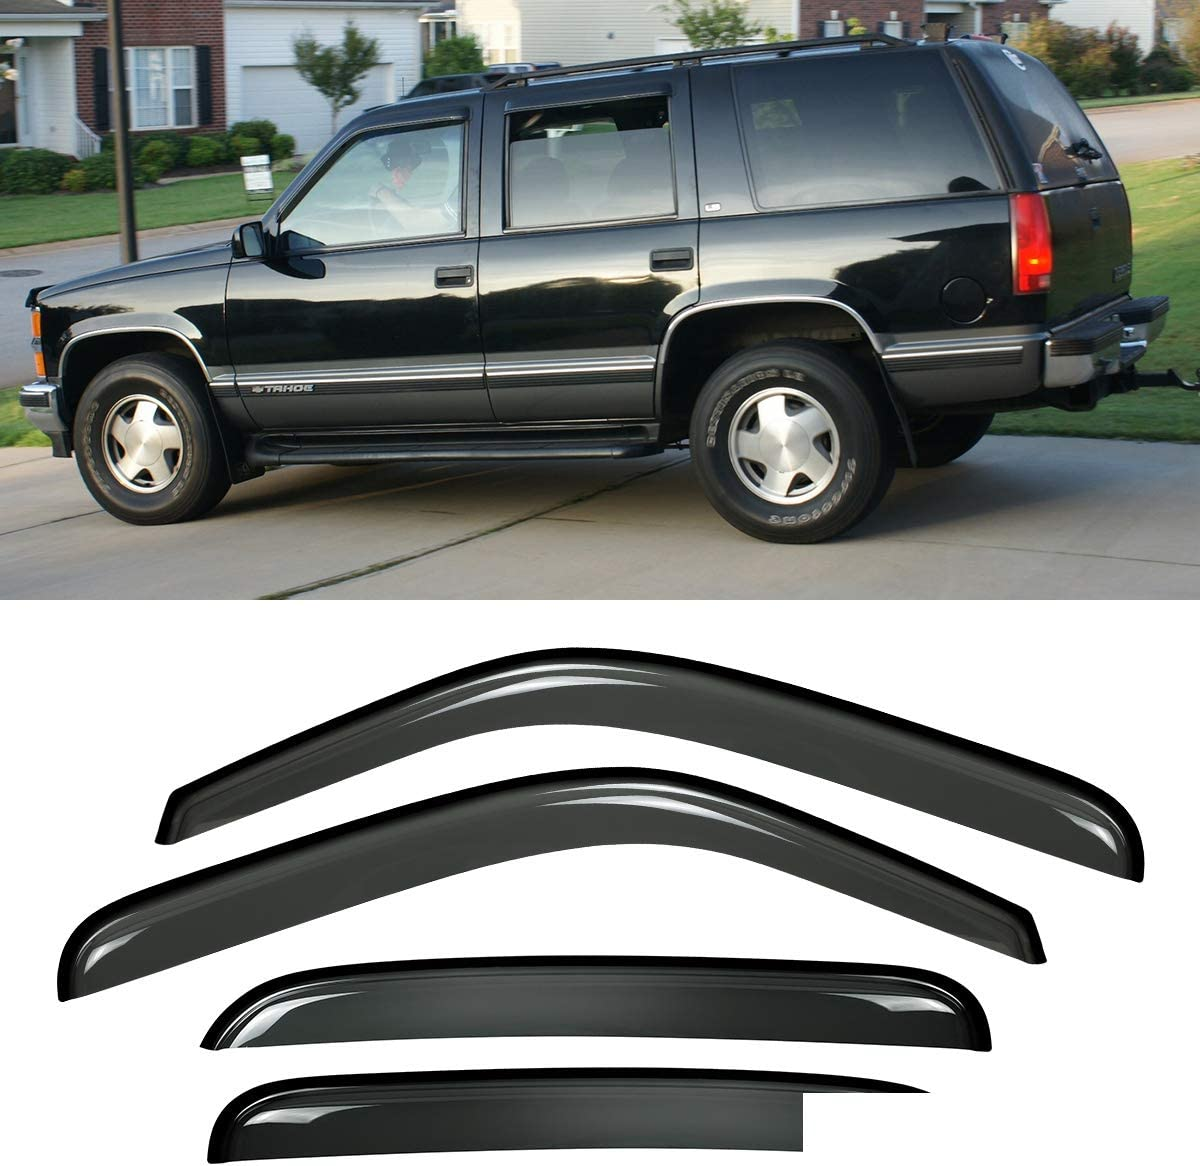 Deebior 4pcs Dark Smoke Tinted New color Sun Rain Guard Lowest price challenge Vent Window Shade